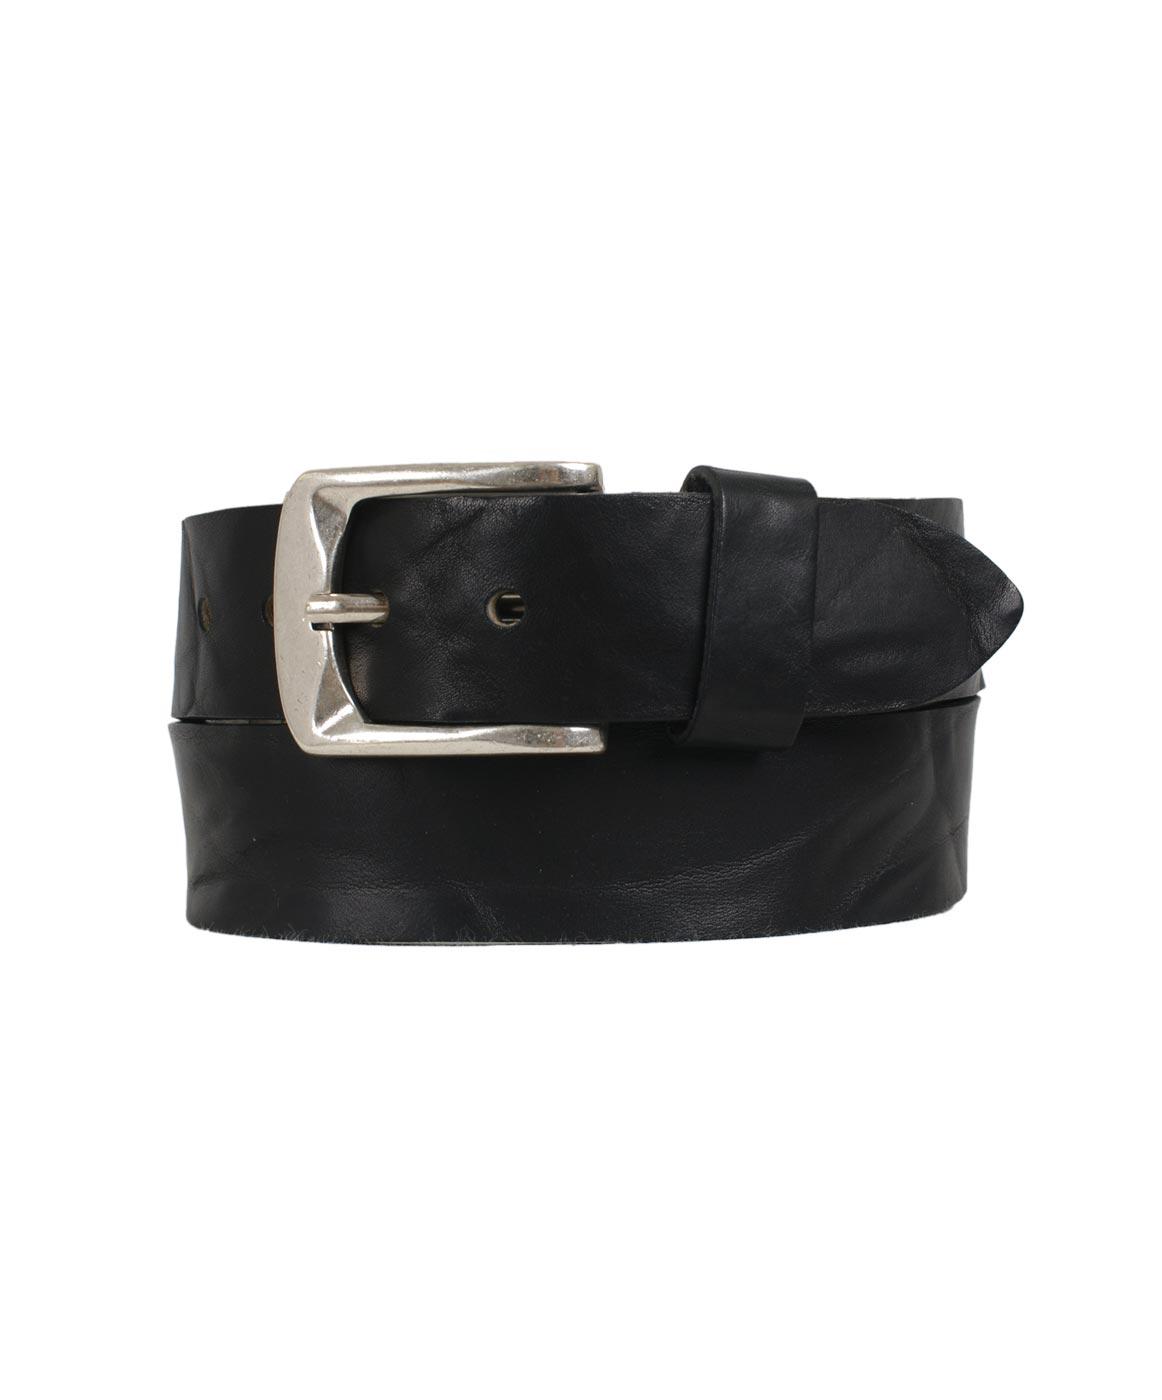 Guertel - Bernd Götz Ledergürtel Damen 4cm Walklederg.geprägt in Black  - Onlineshop Jeans Meile